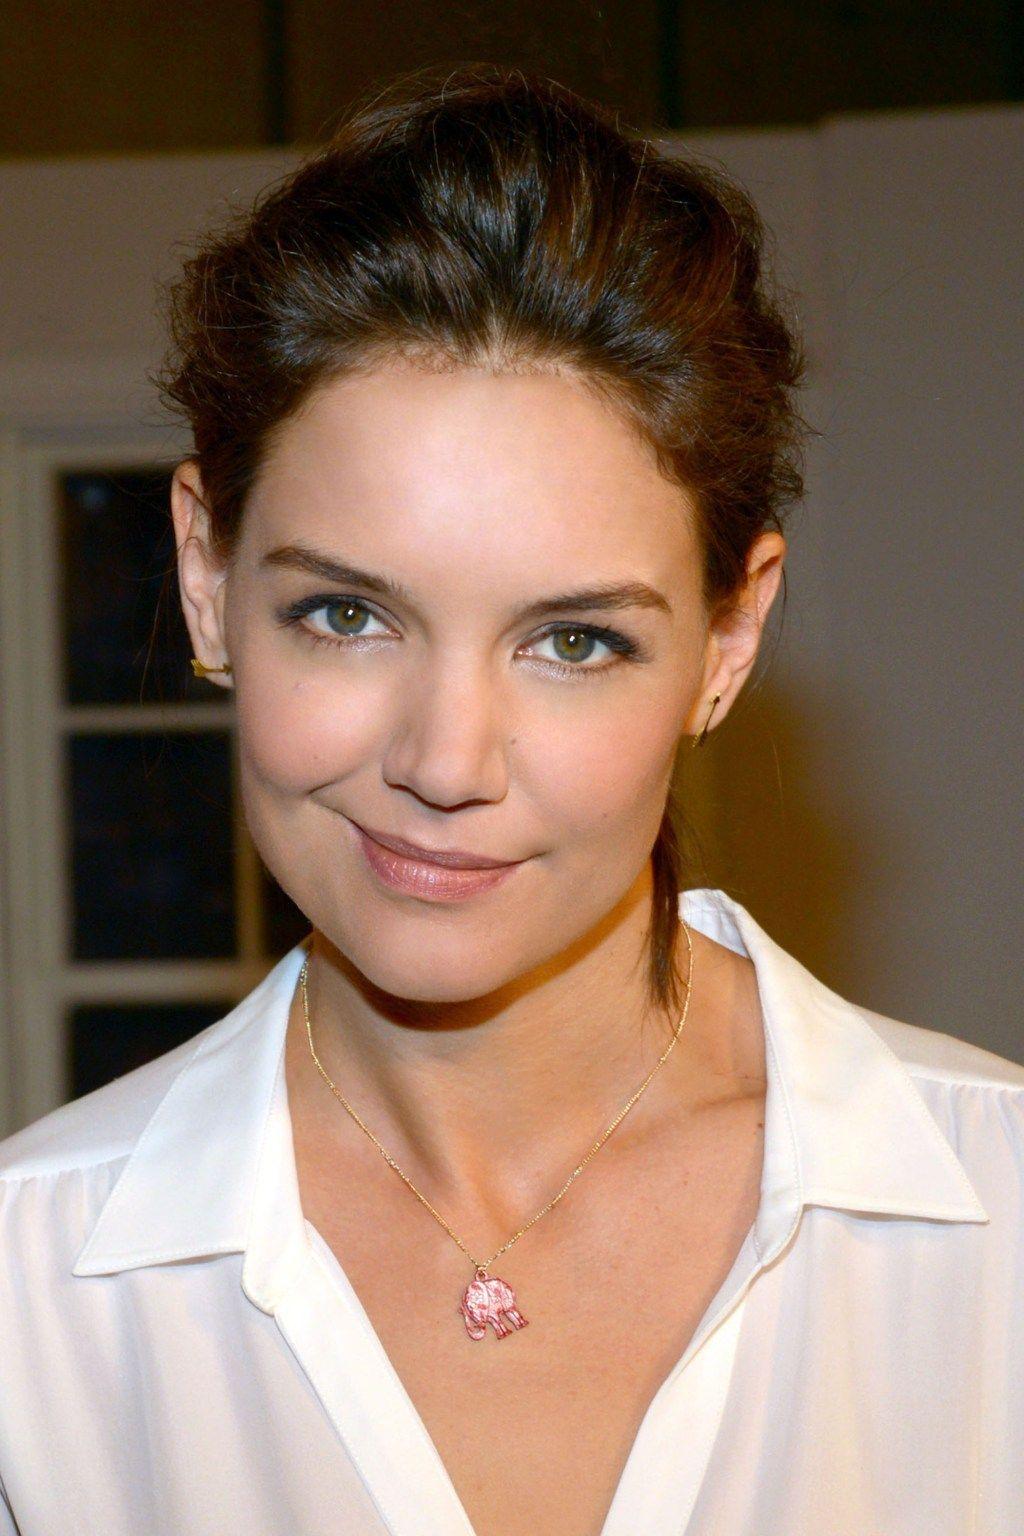 Found: Katie Holmes' Favorite Necklace (That Benefits Breast CancerResearch)